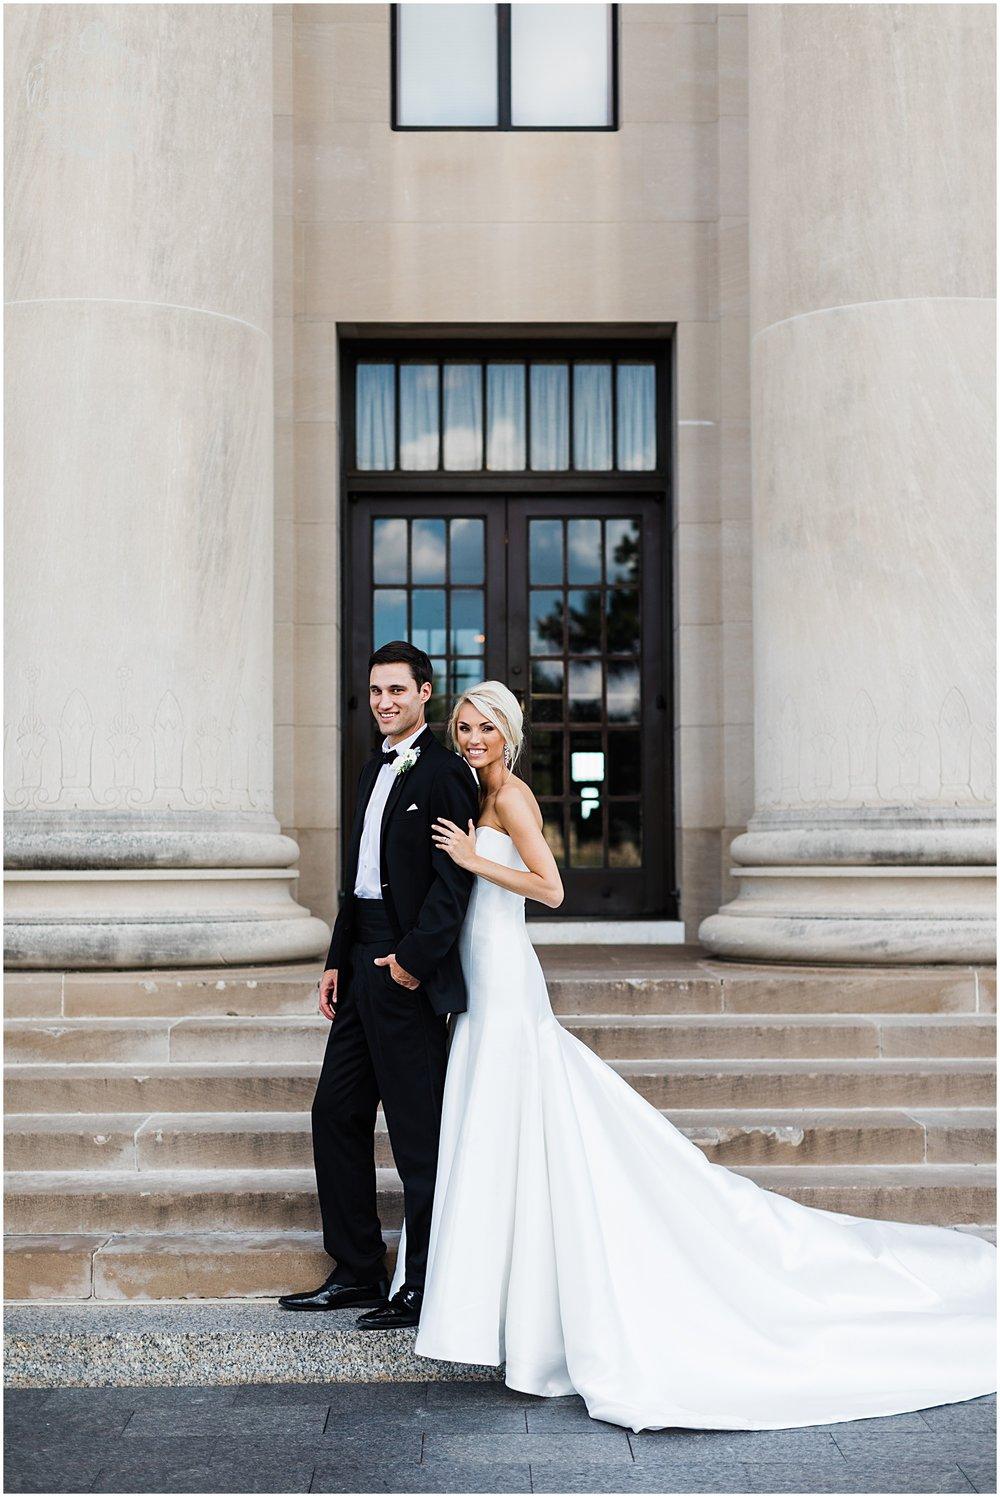 NOLL WEDDING | THE BRASS ON BALTIMORE | MARISSA CRIBBS PHOTOGRAPHY_6330.jpg